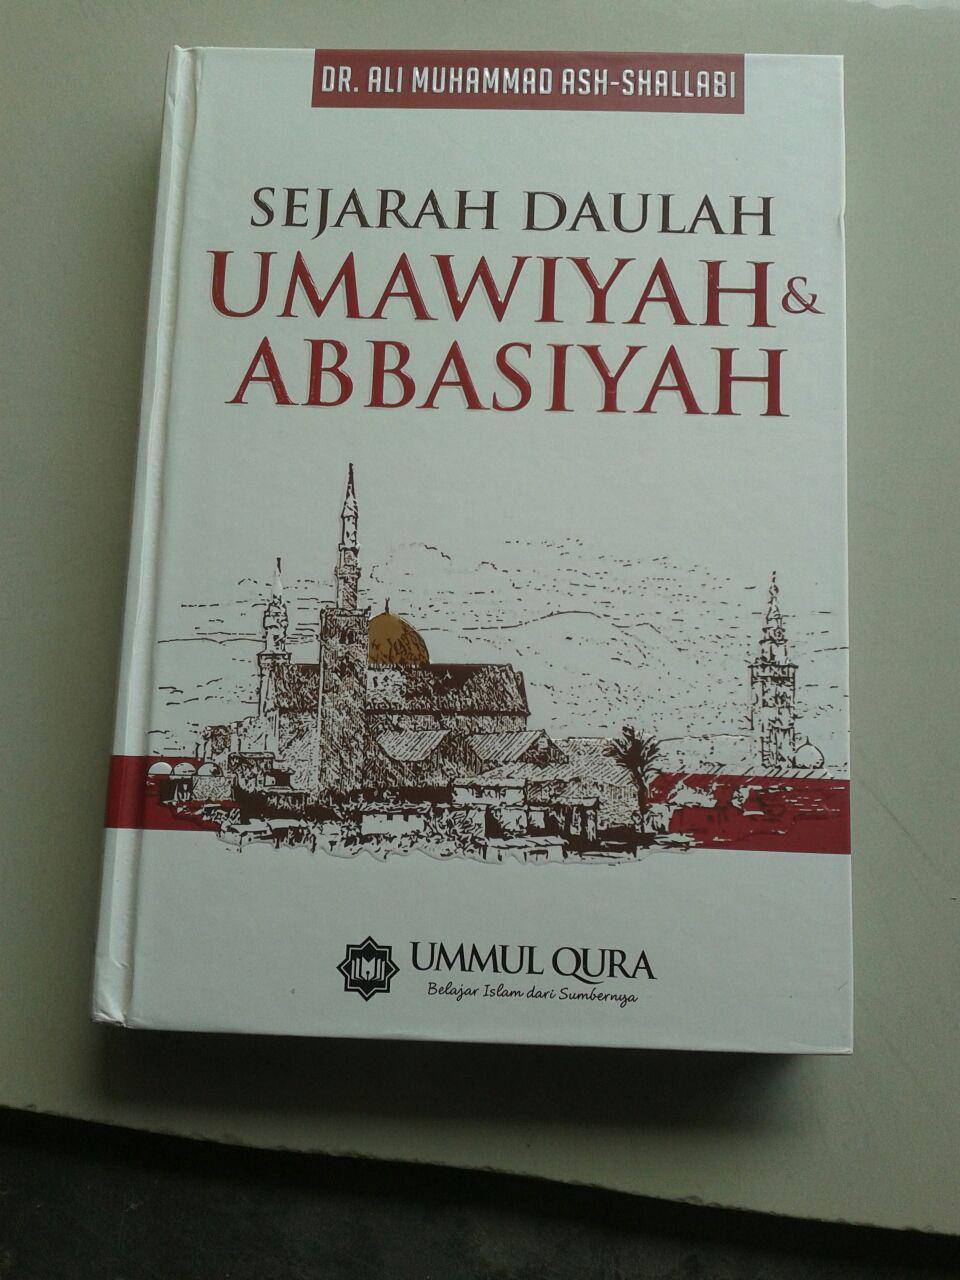 Buku Sejarah Daulah Umawiyah & Abbasiyah cover 2